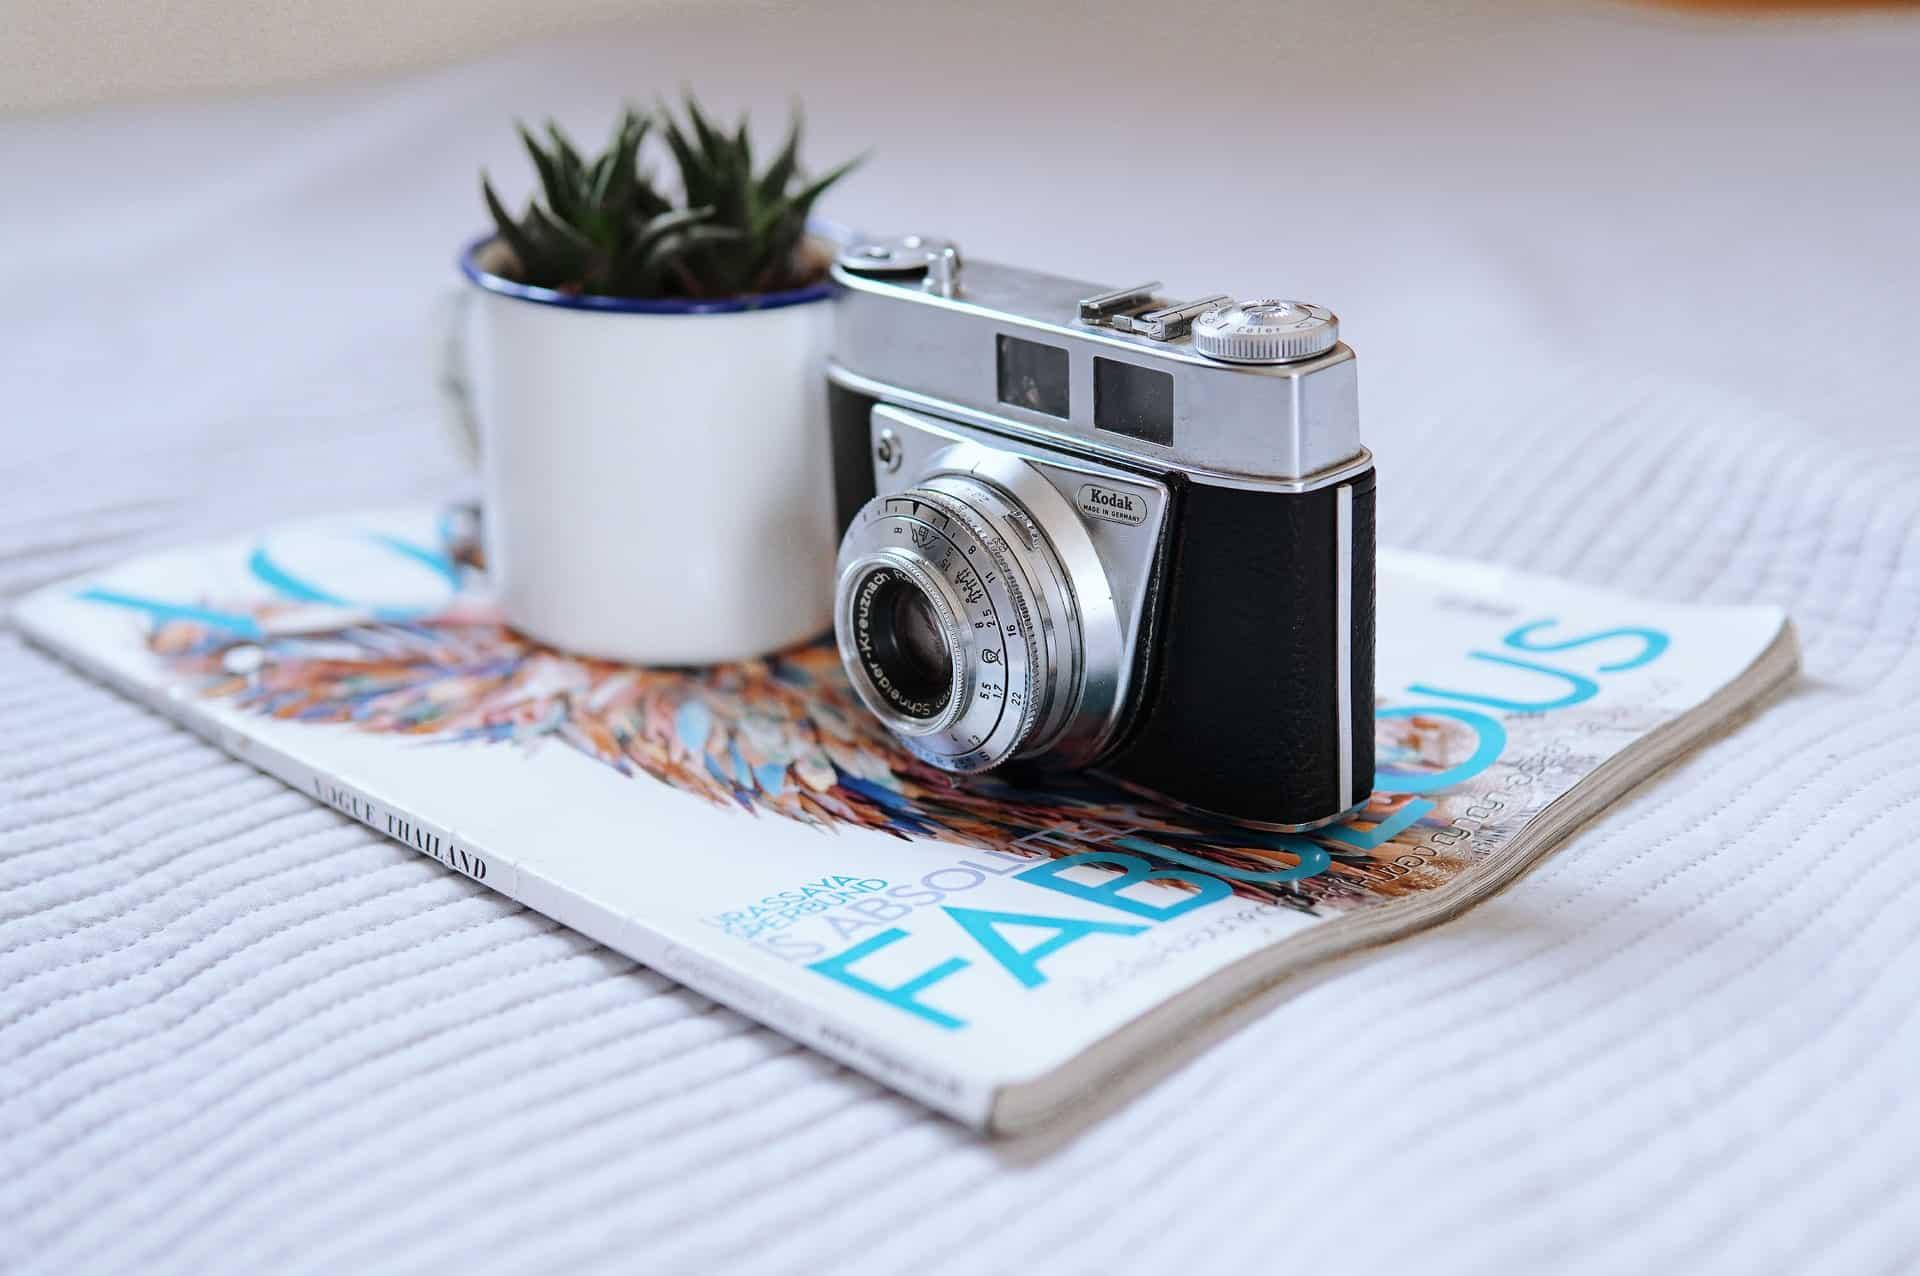 Kodack digital photo frames